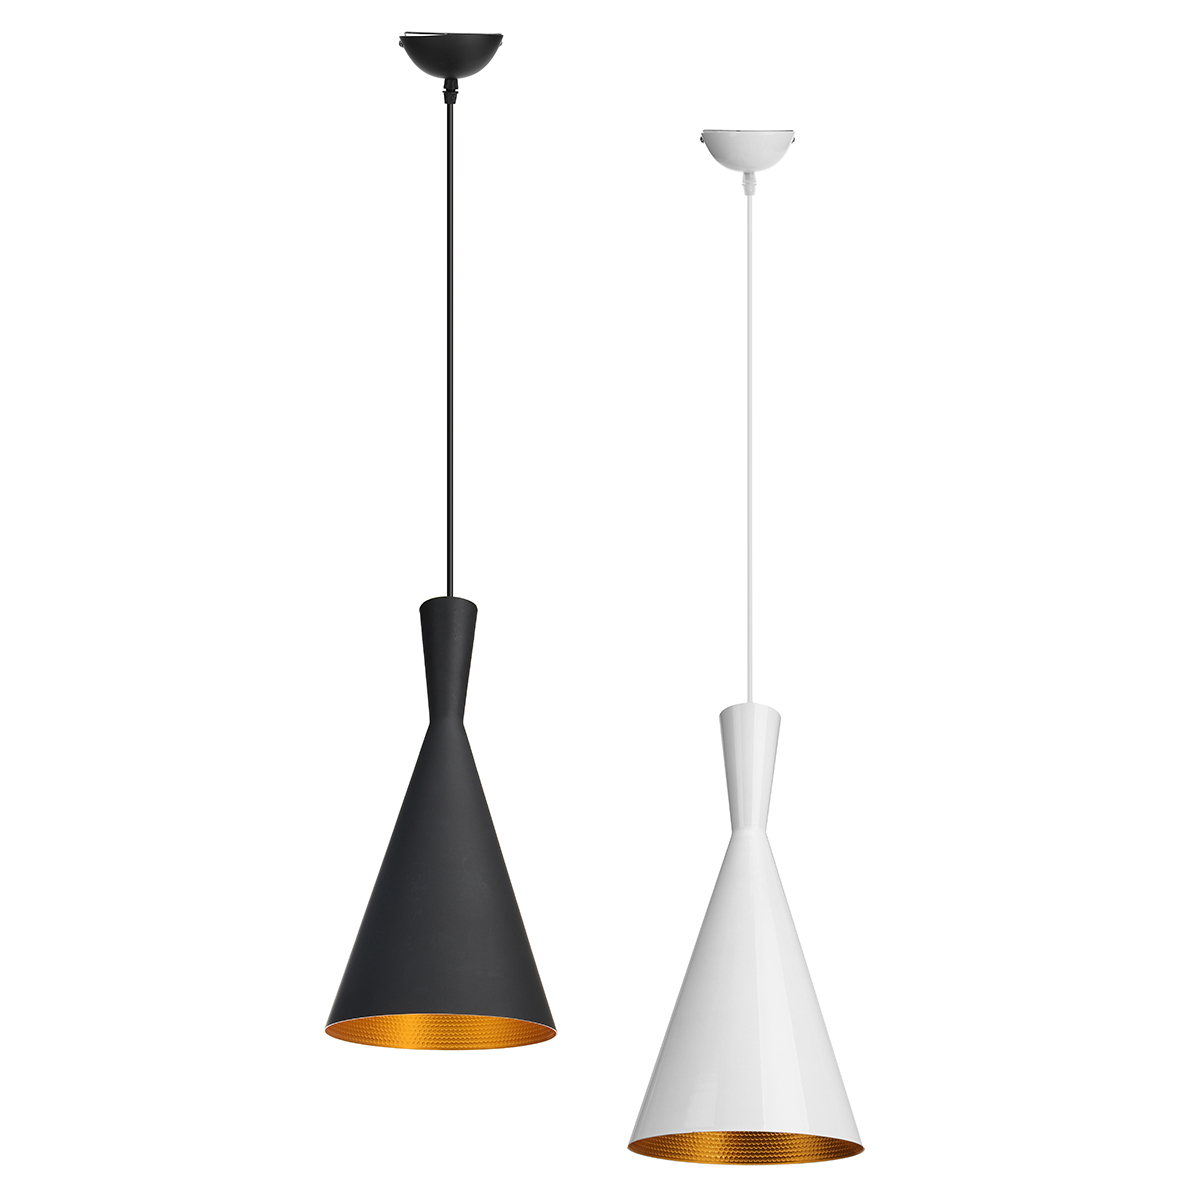 Vintage Retro Style Modern Metal Decor Pendant Light Shade Lampshades For Living Room Coffee Shop White Black